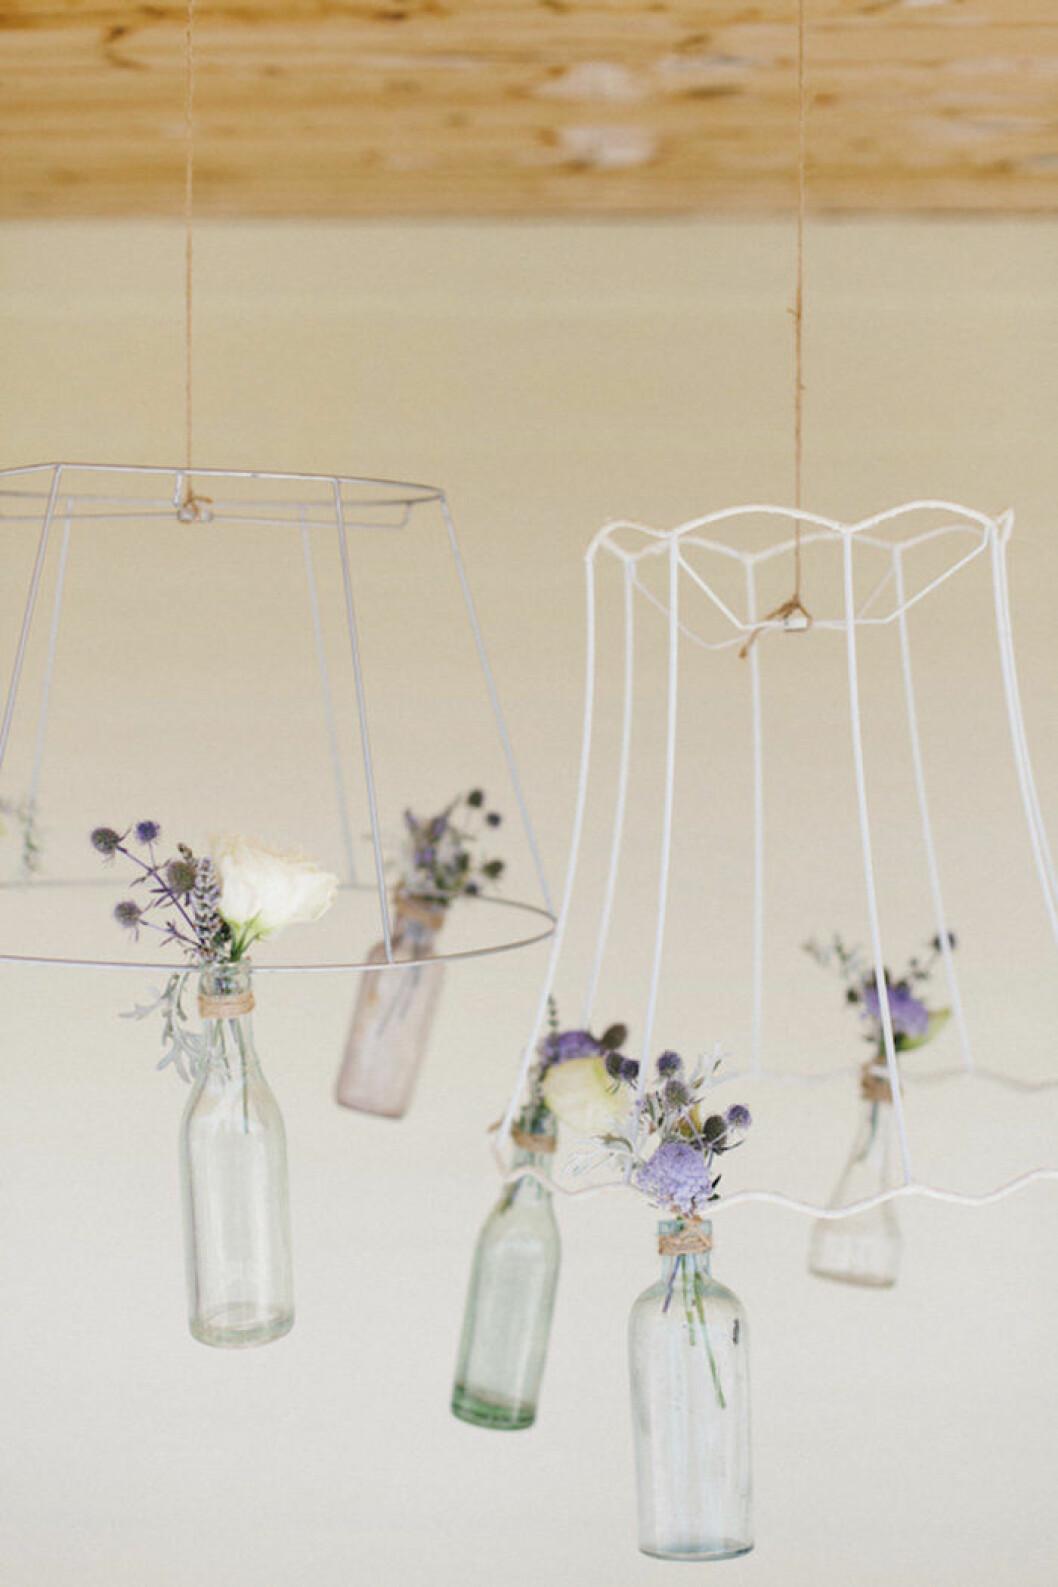 Blomsterarrangemang med flaskor